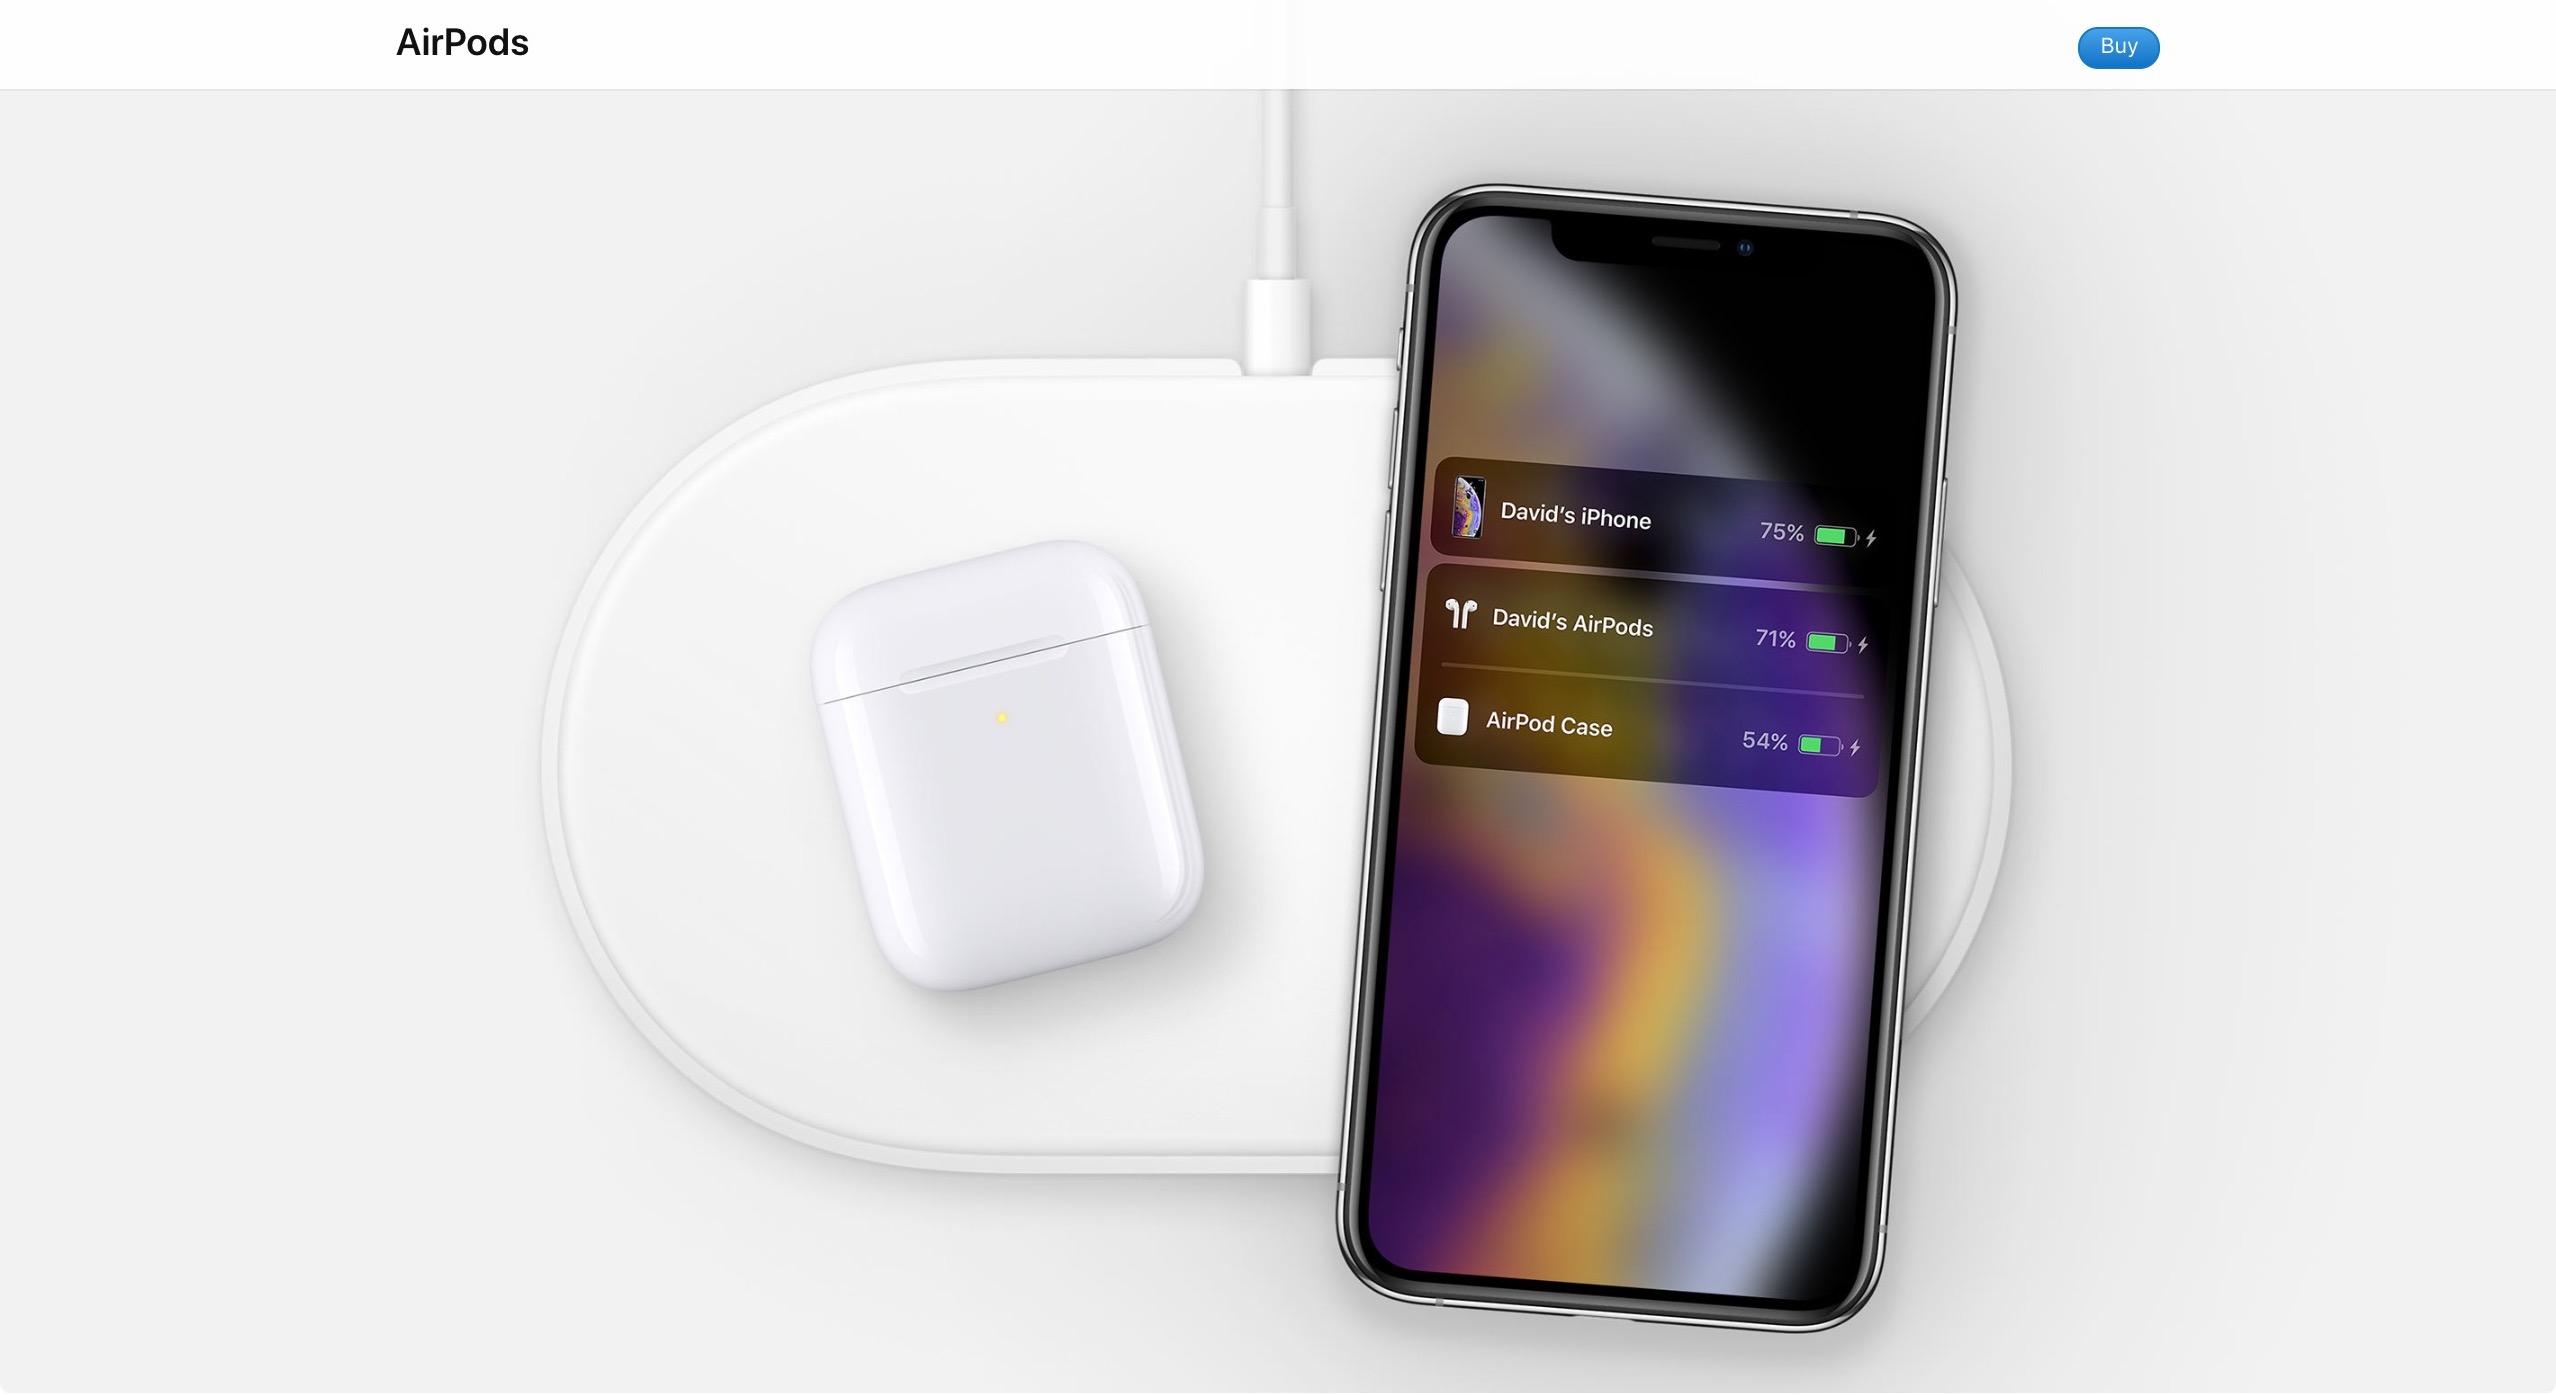 「AirPower」の新しい画像を発見。Appleみずから漏らす